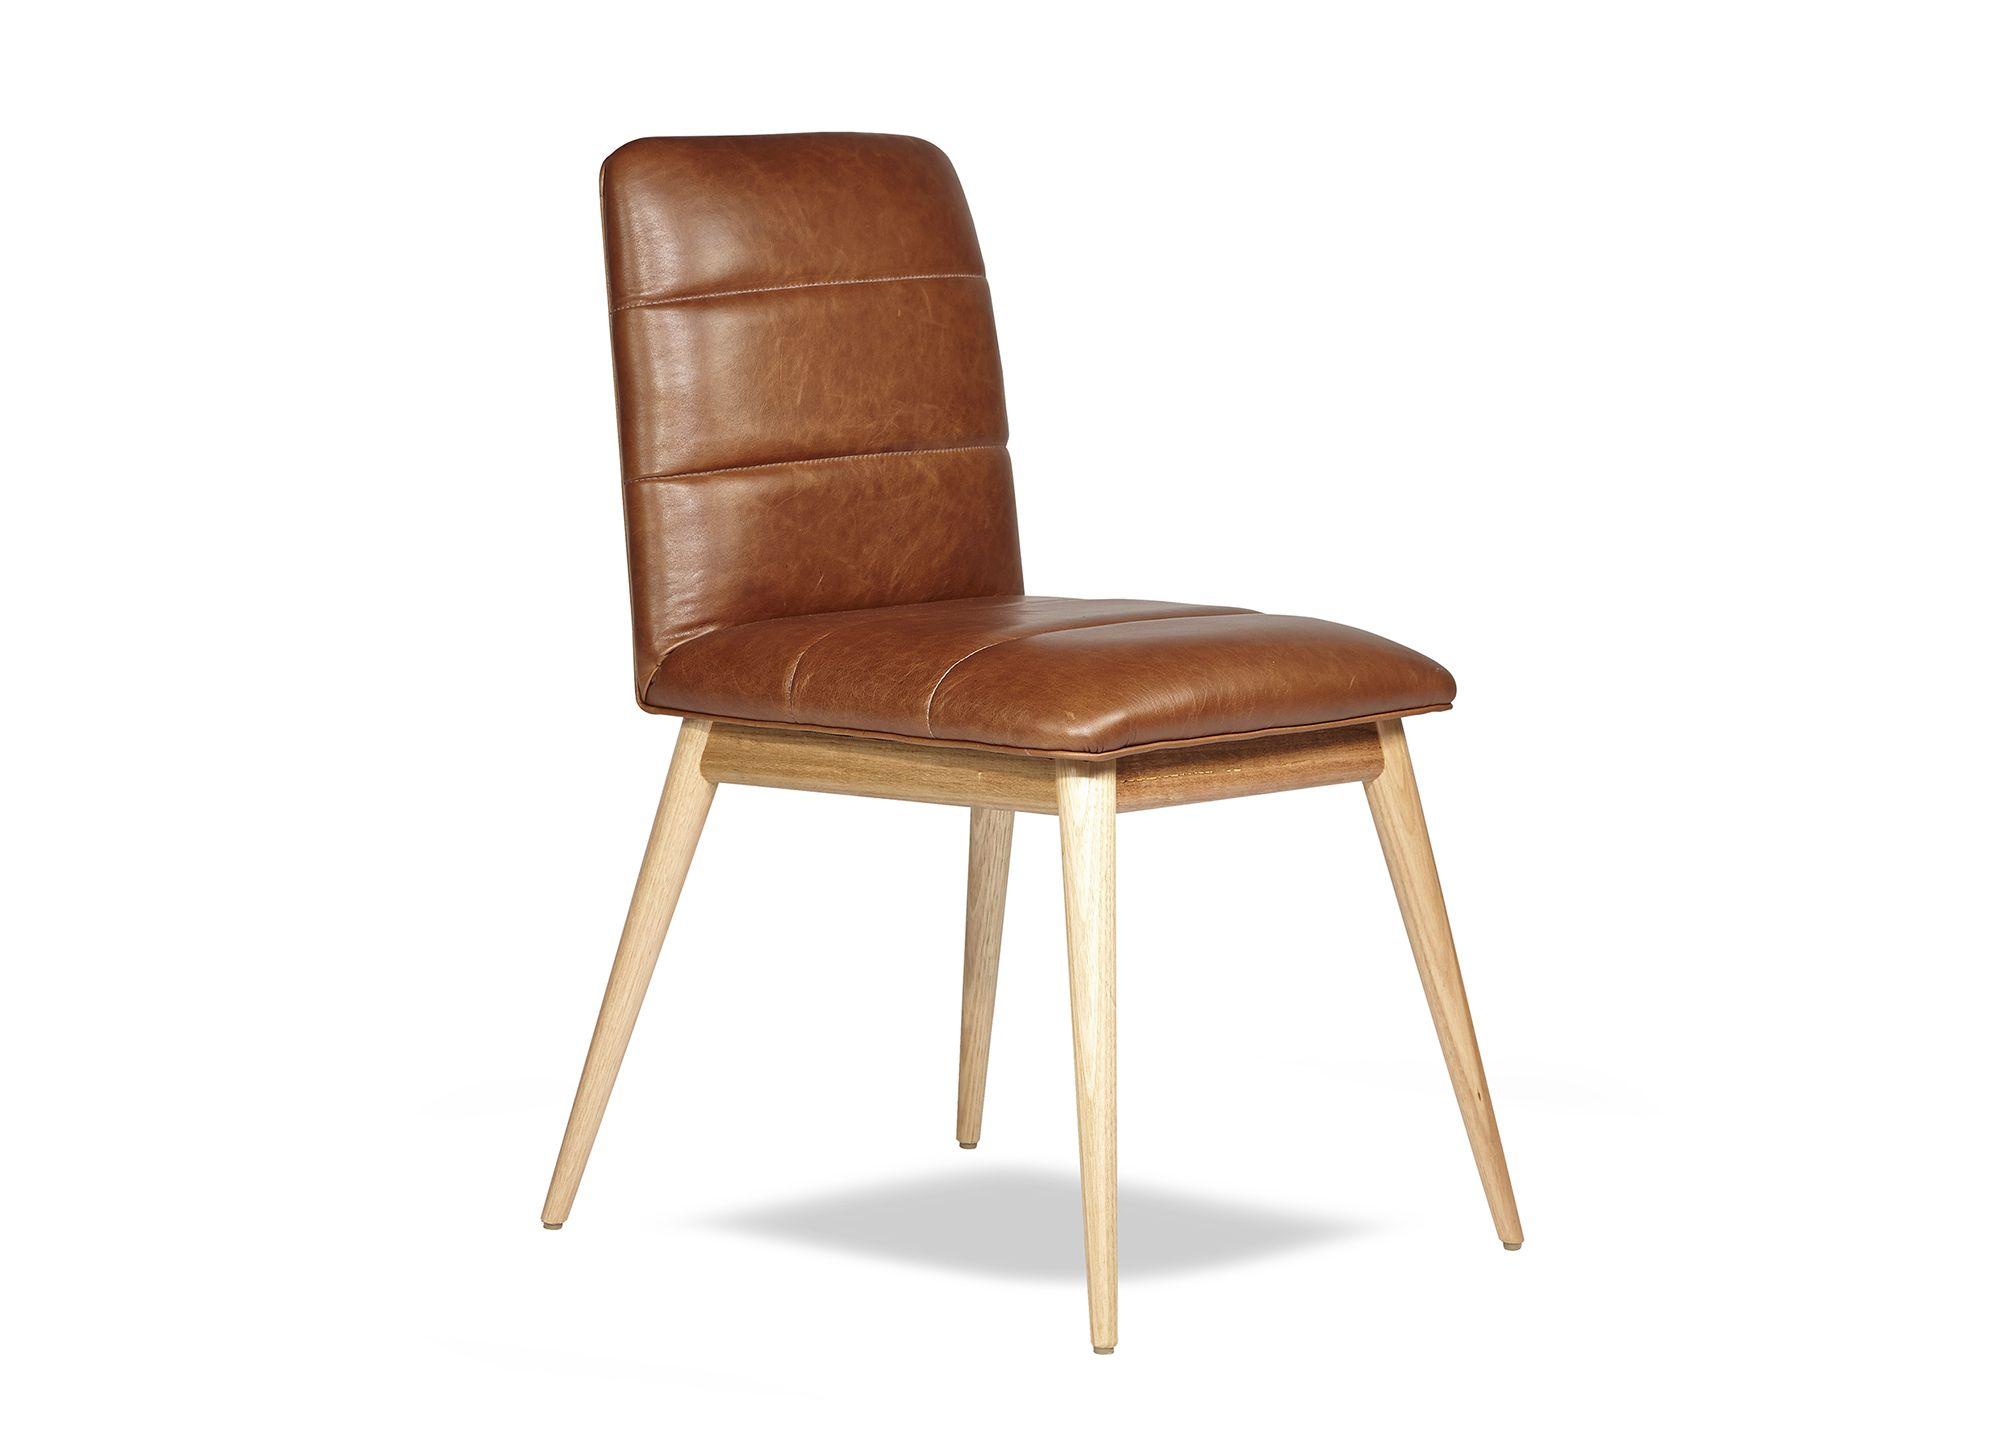 Arthur G Reuben Chair Leather Dining Chair Australian